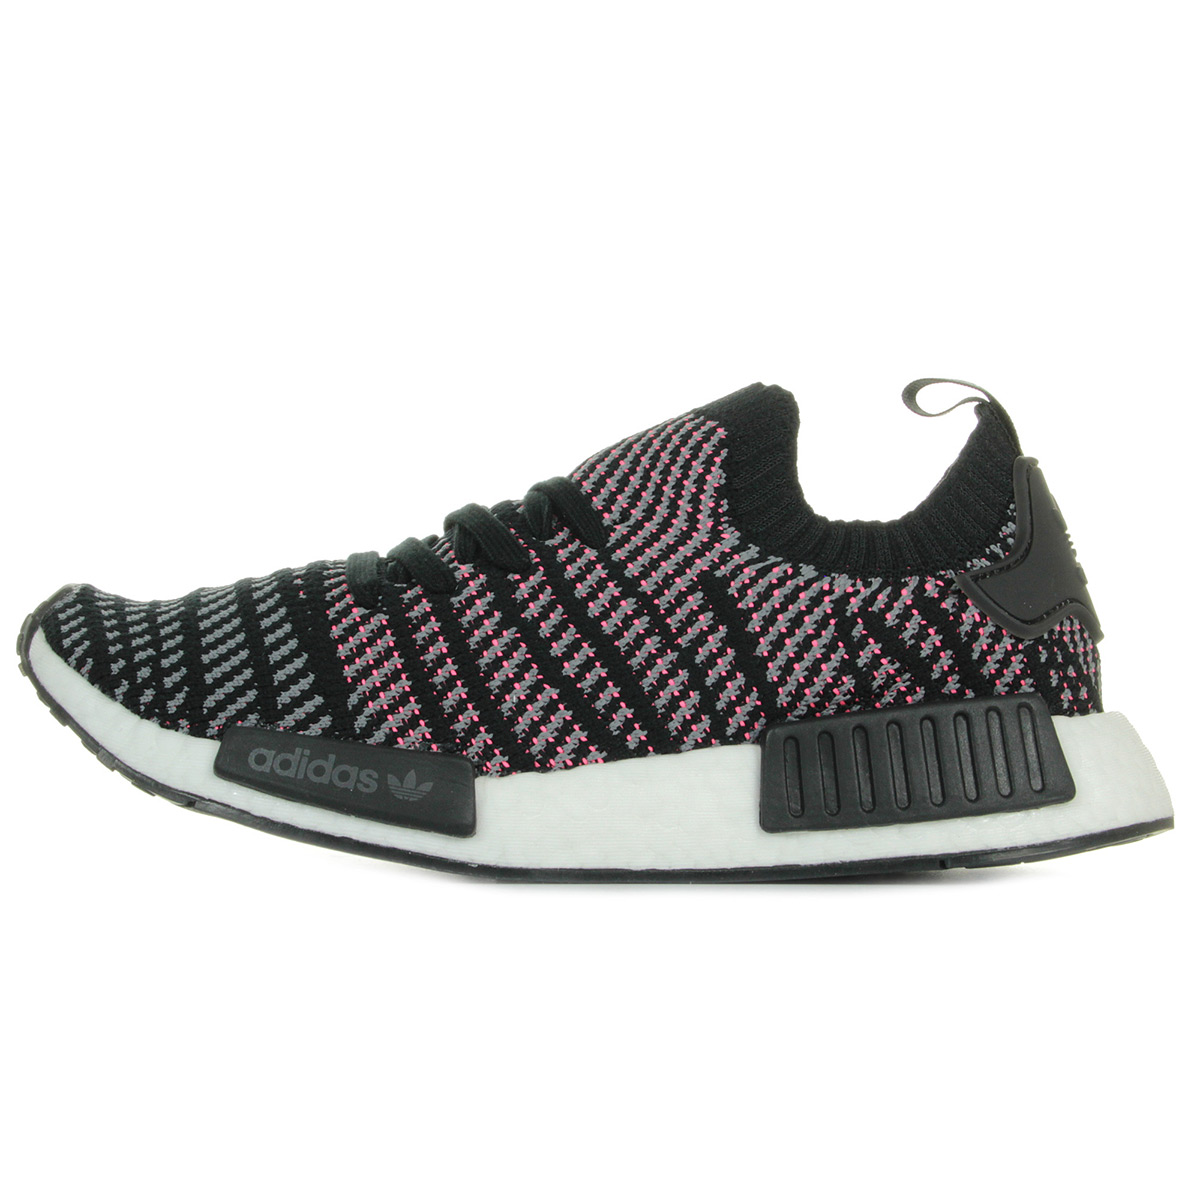 adidas Nmd R1 Stlt Pk CQ2386, Baskets mode homme